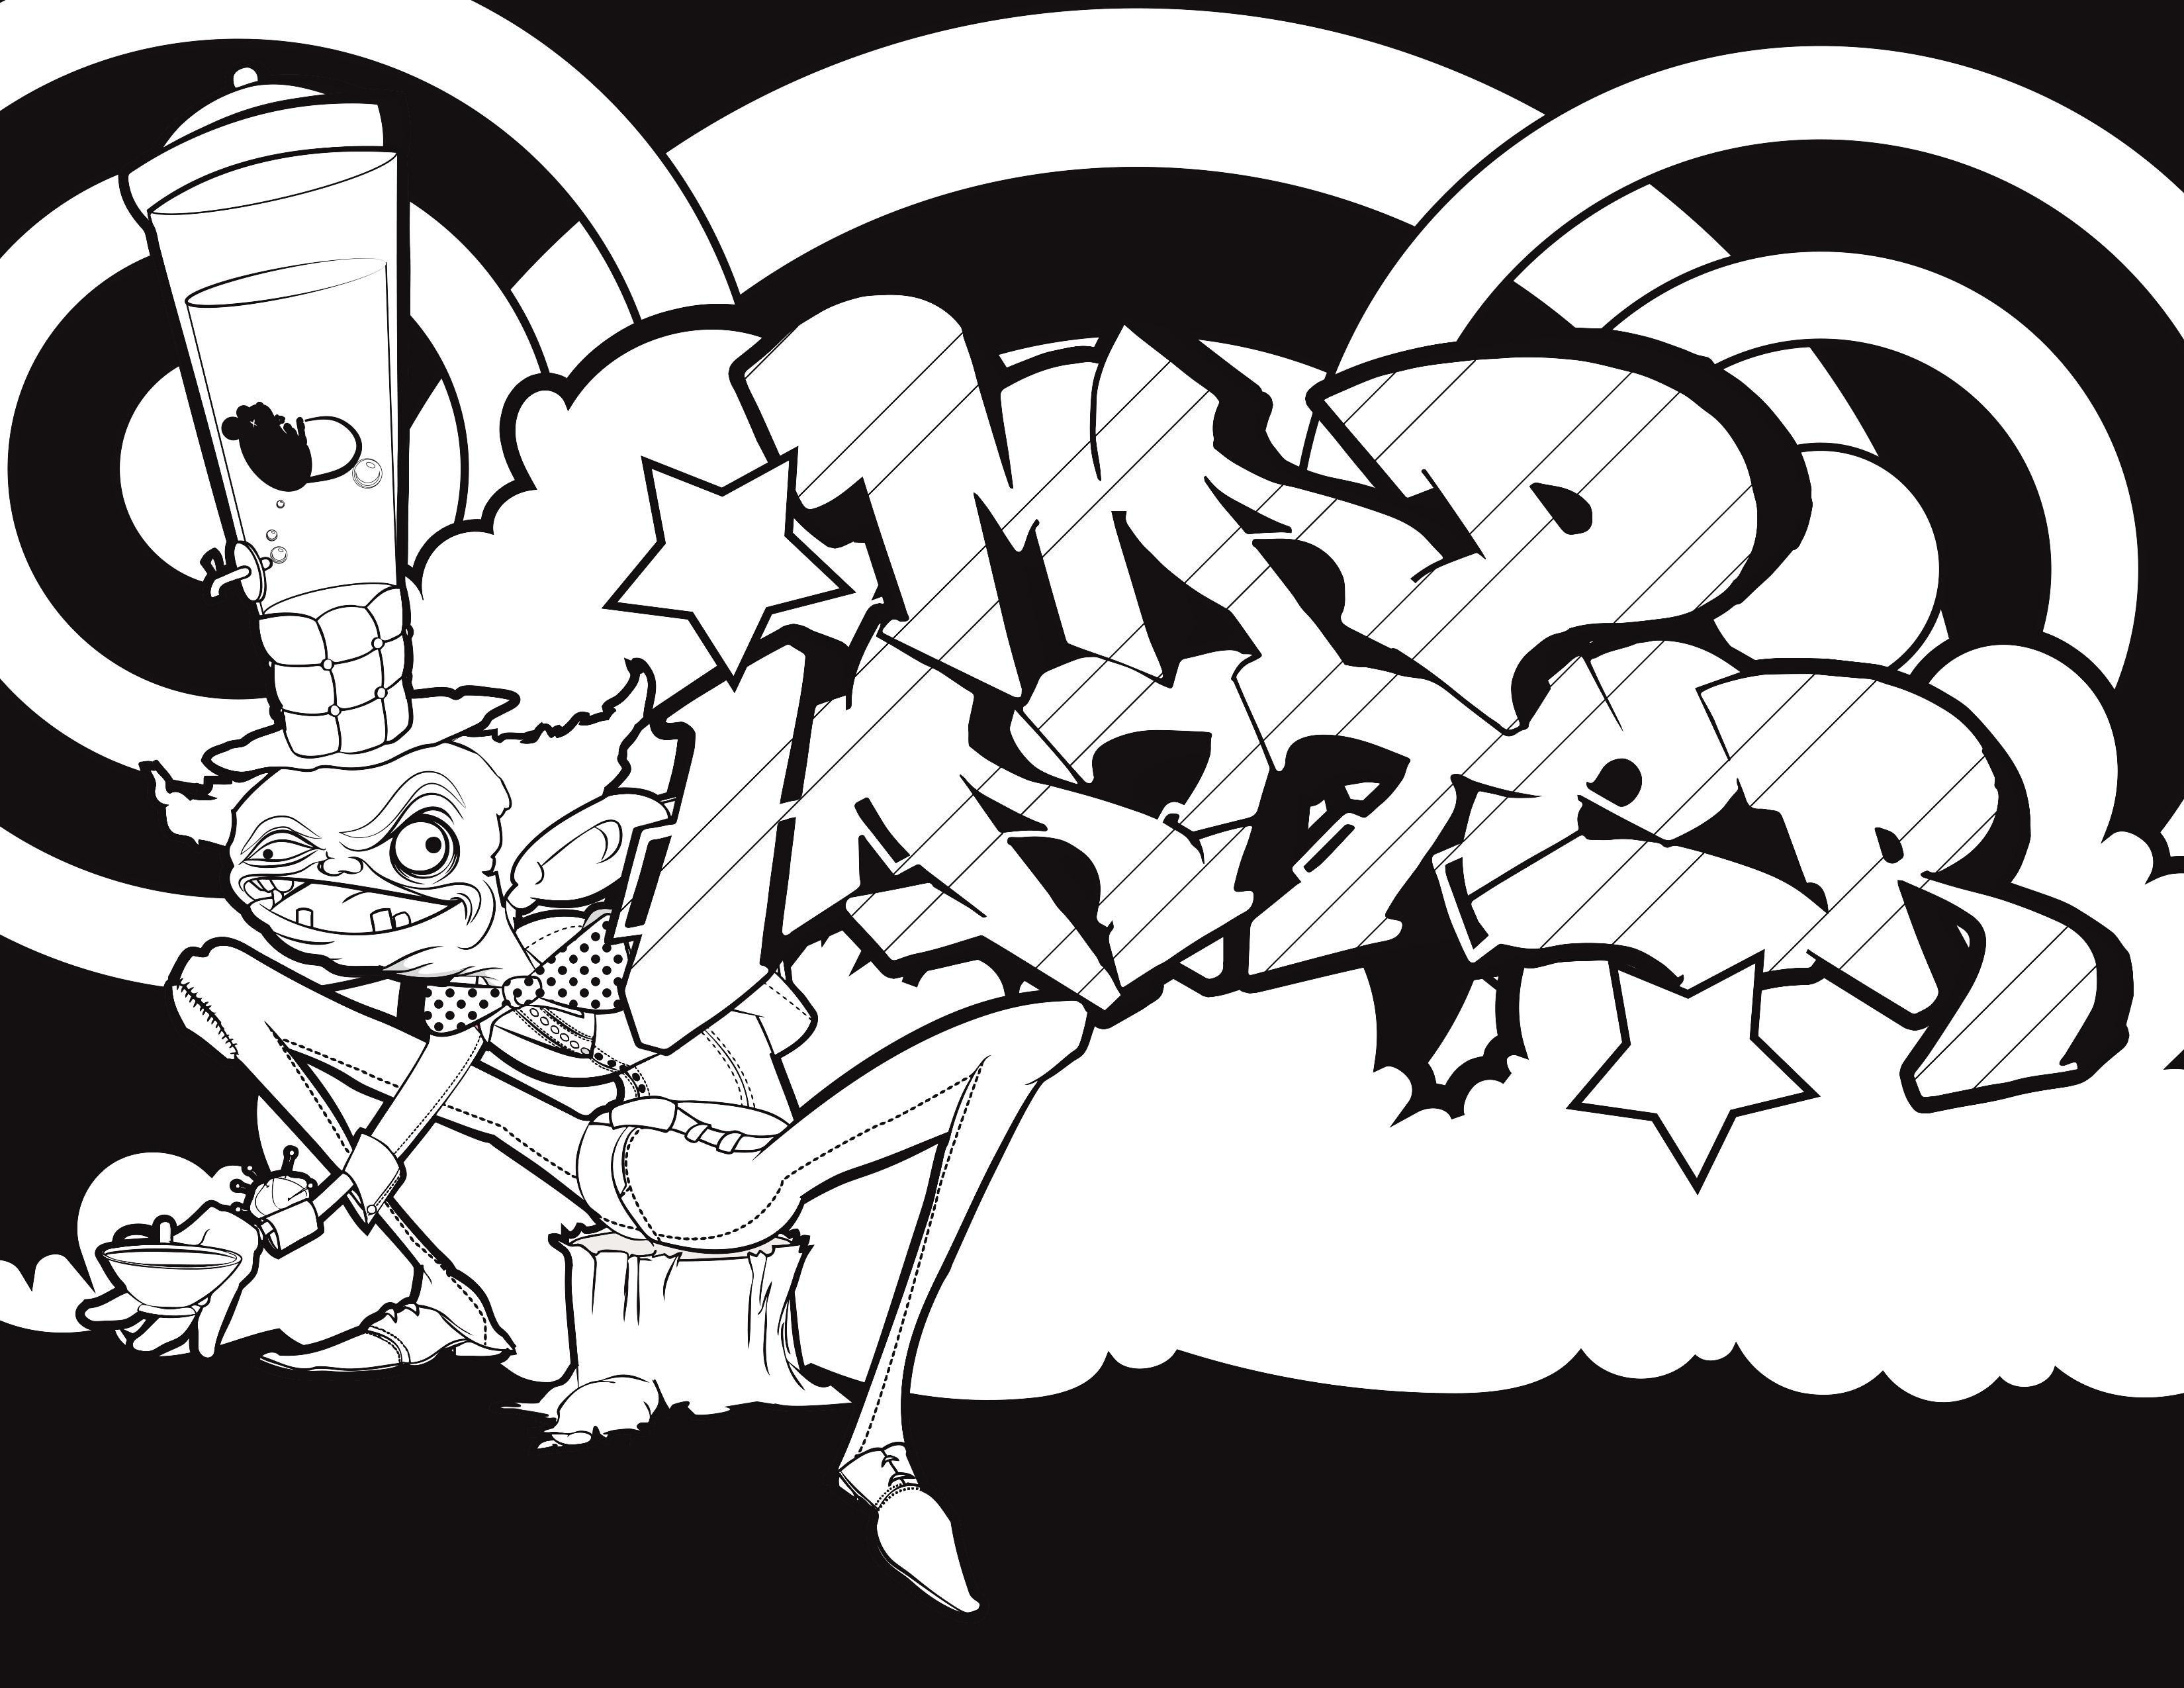 Pin On Graffiti Coloring Book Street Art Coloring Book Graffiti Letters And Graffiti Characters